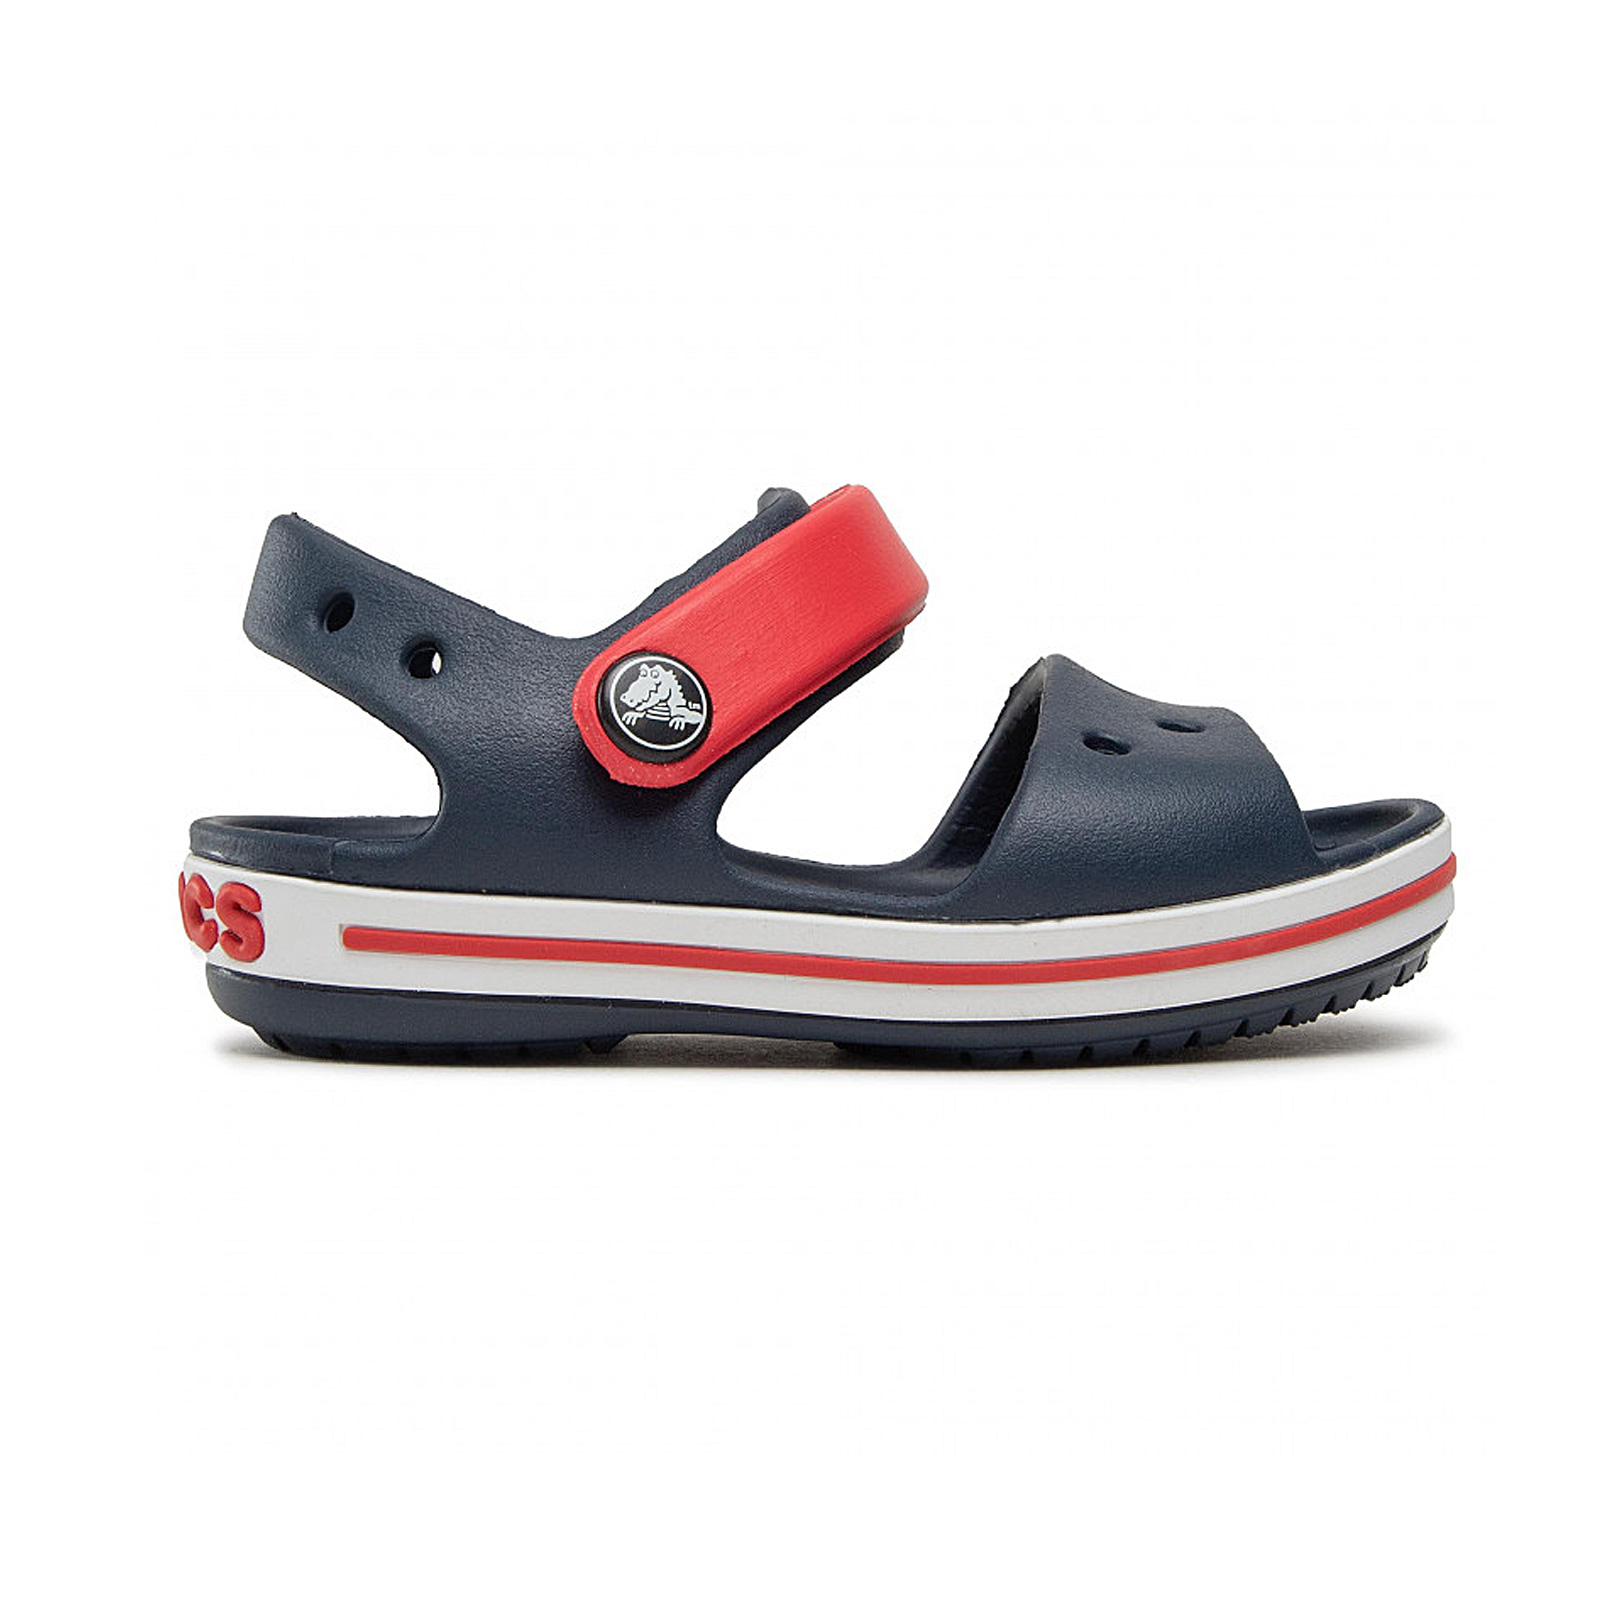 874cddfdc78 Sportcafe Crocs – CROCBAND SANDAL KIDS – NAVY/RED